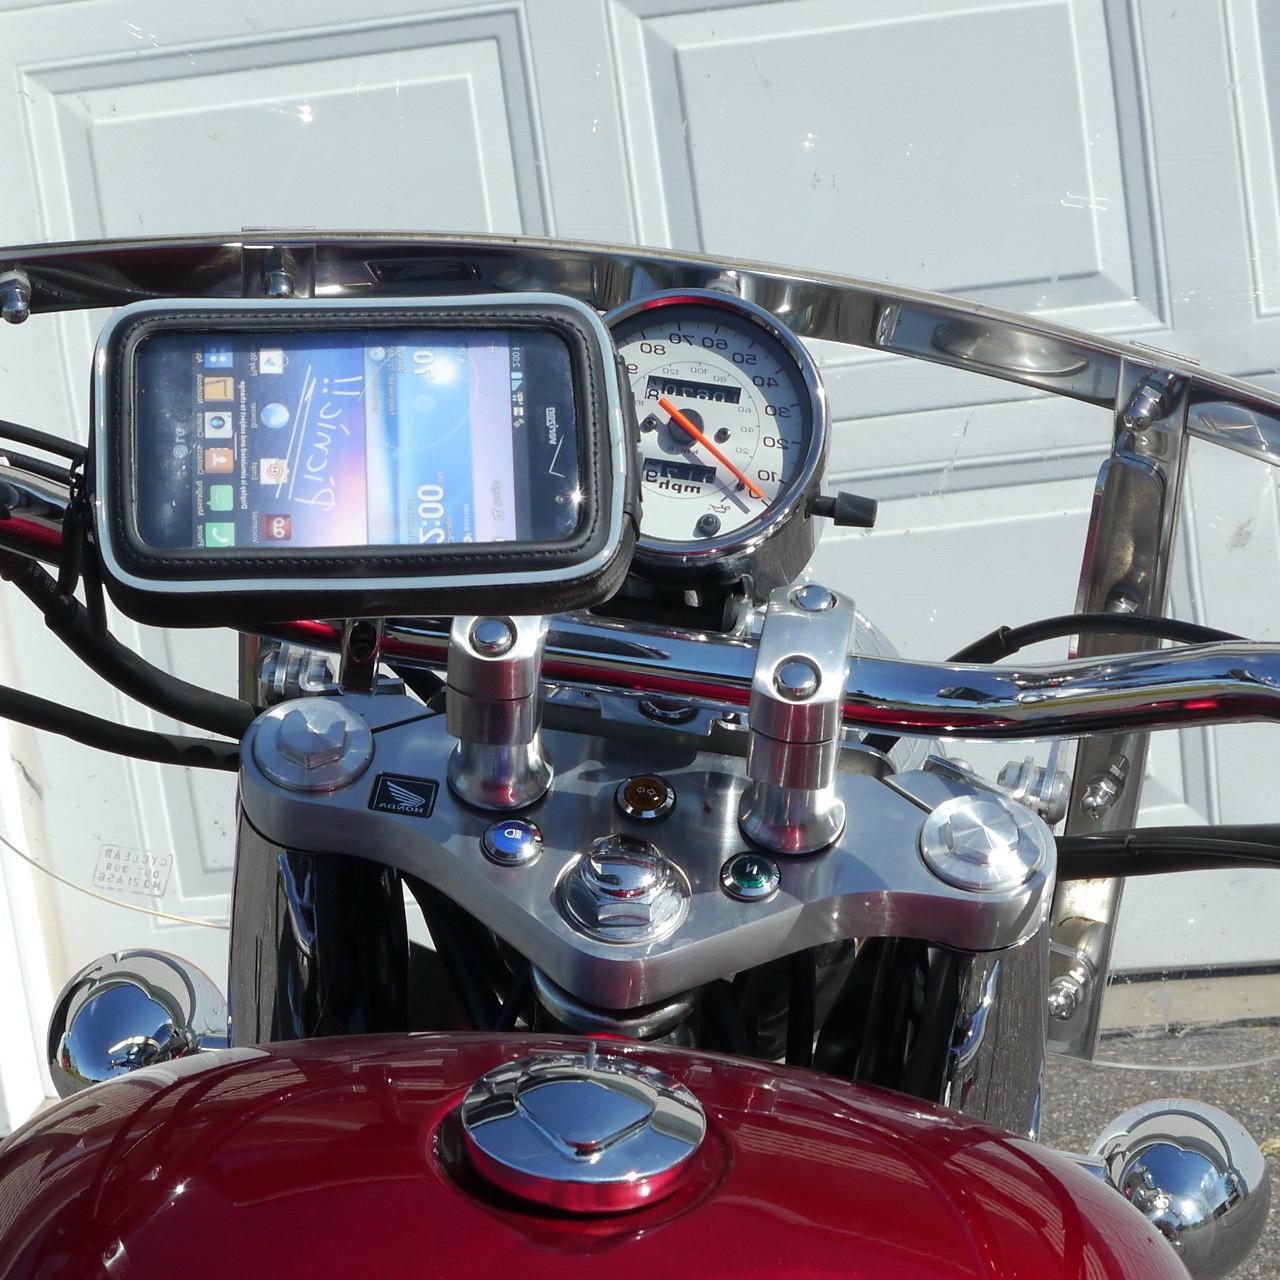 手機皮套手機架機車導航摩托車架oppo r9 lg g5 huawei p9 mate 8 asus zenfone 3 2 laserdeluxe go tv zenfone3 zenfone2